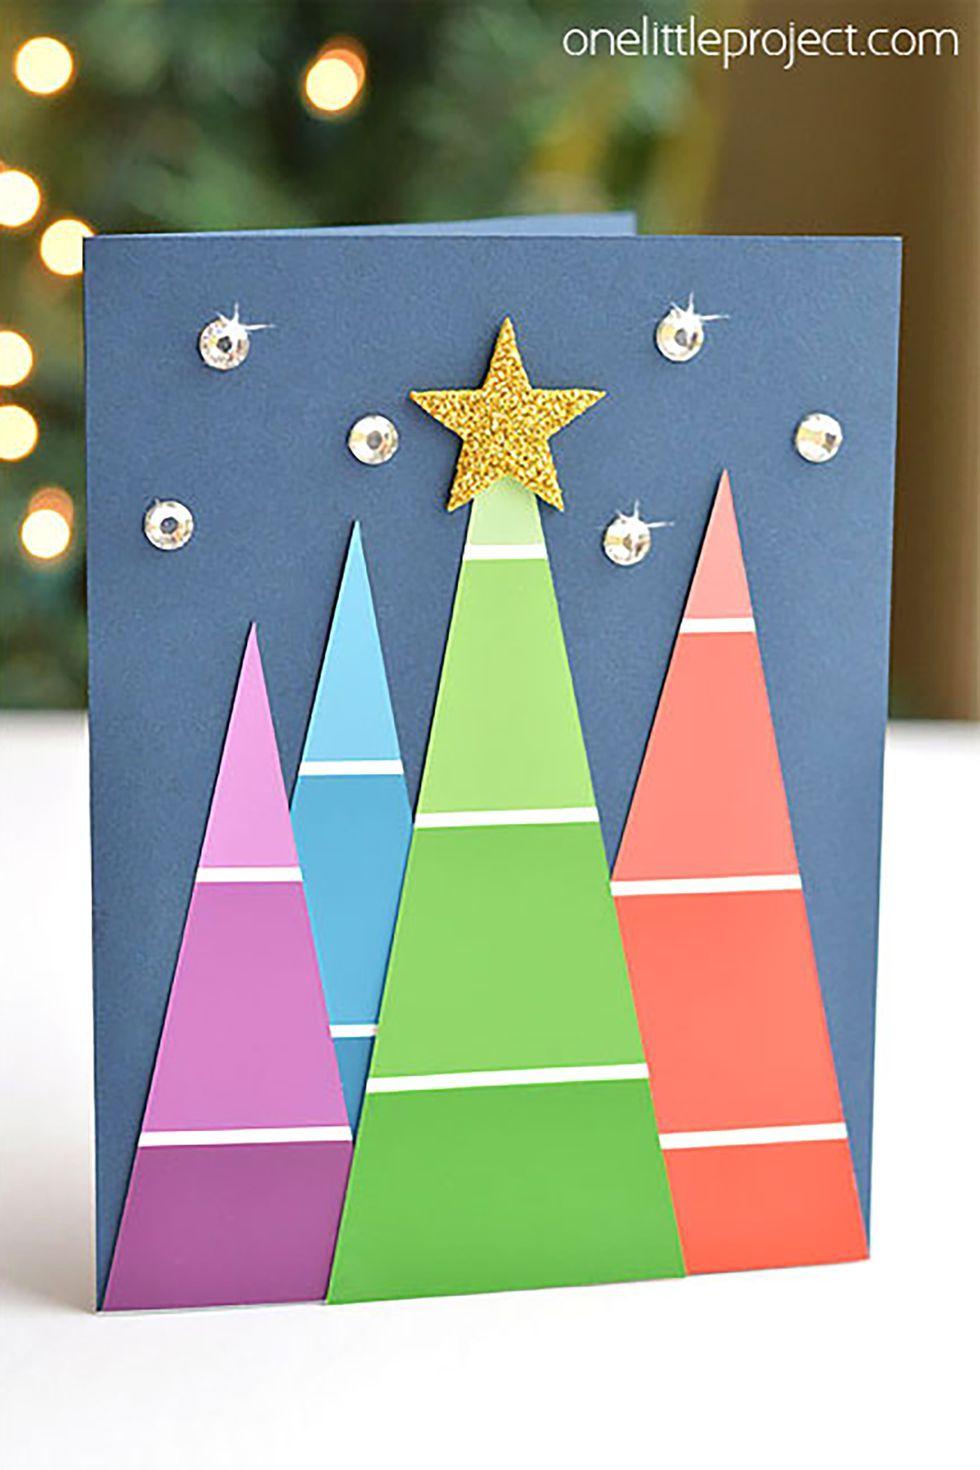 30 Diy Christmas Card Ideas To Show Your Creativity This Season